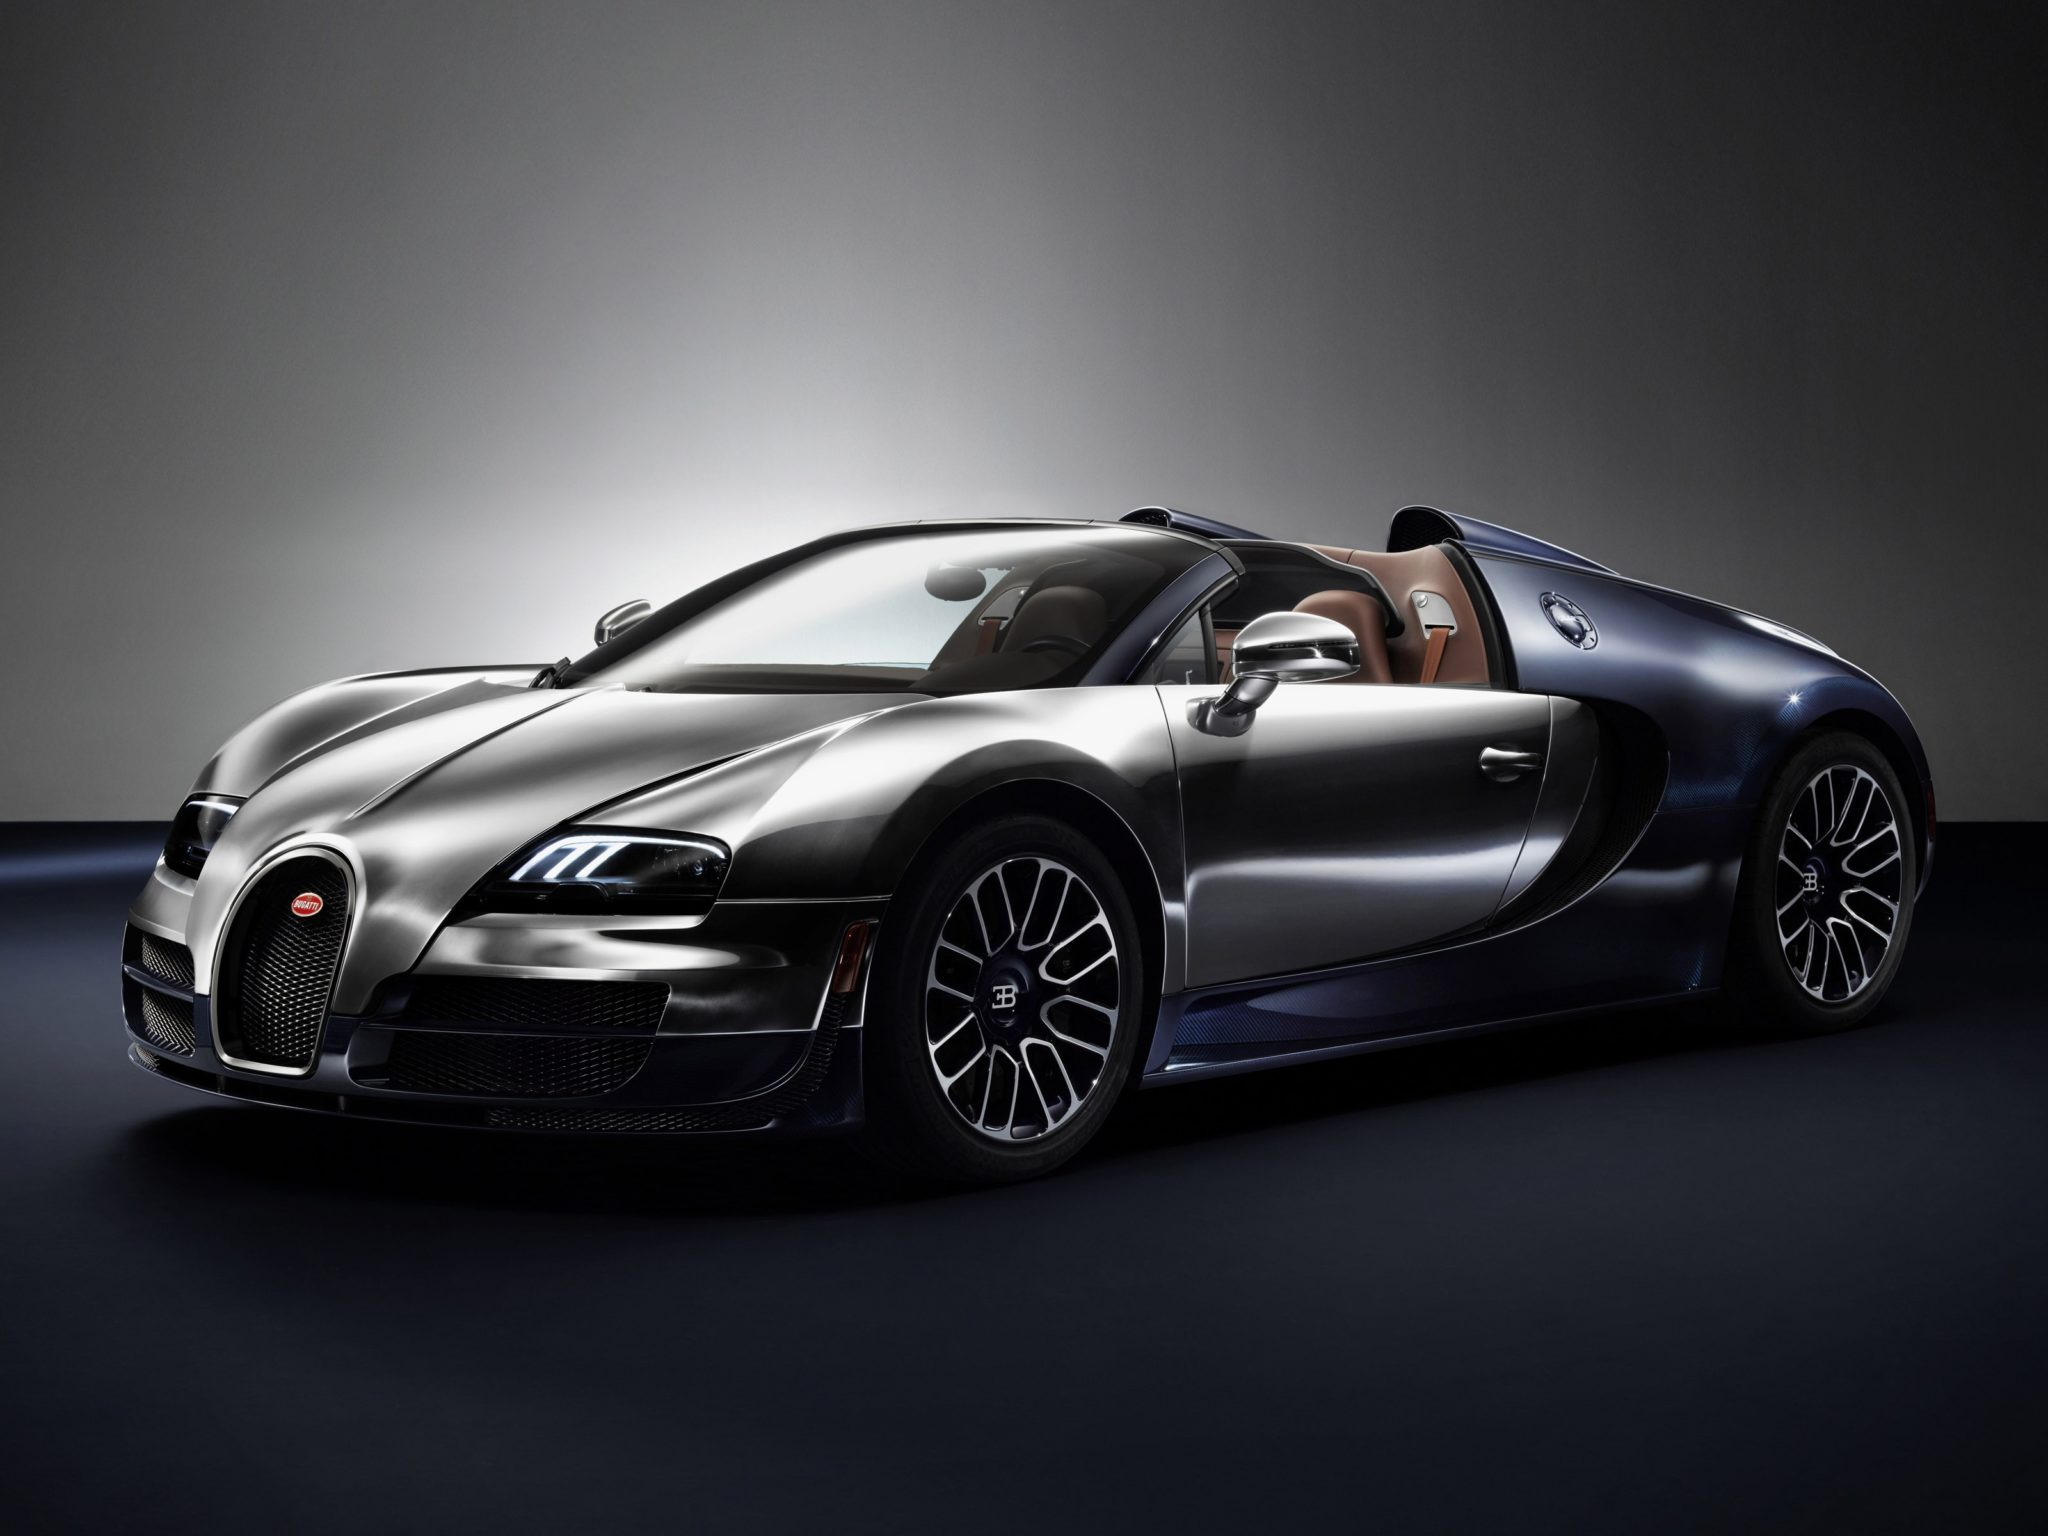 Bugatti Veyron Grand Sport Roadster Vitesse Ettore (2014)